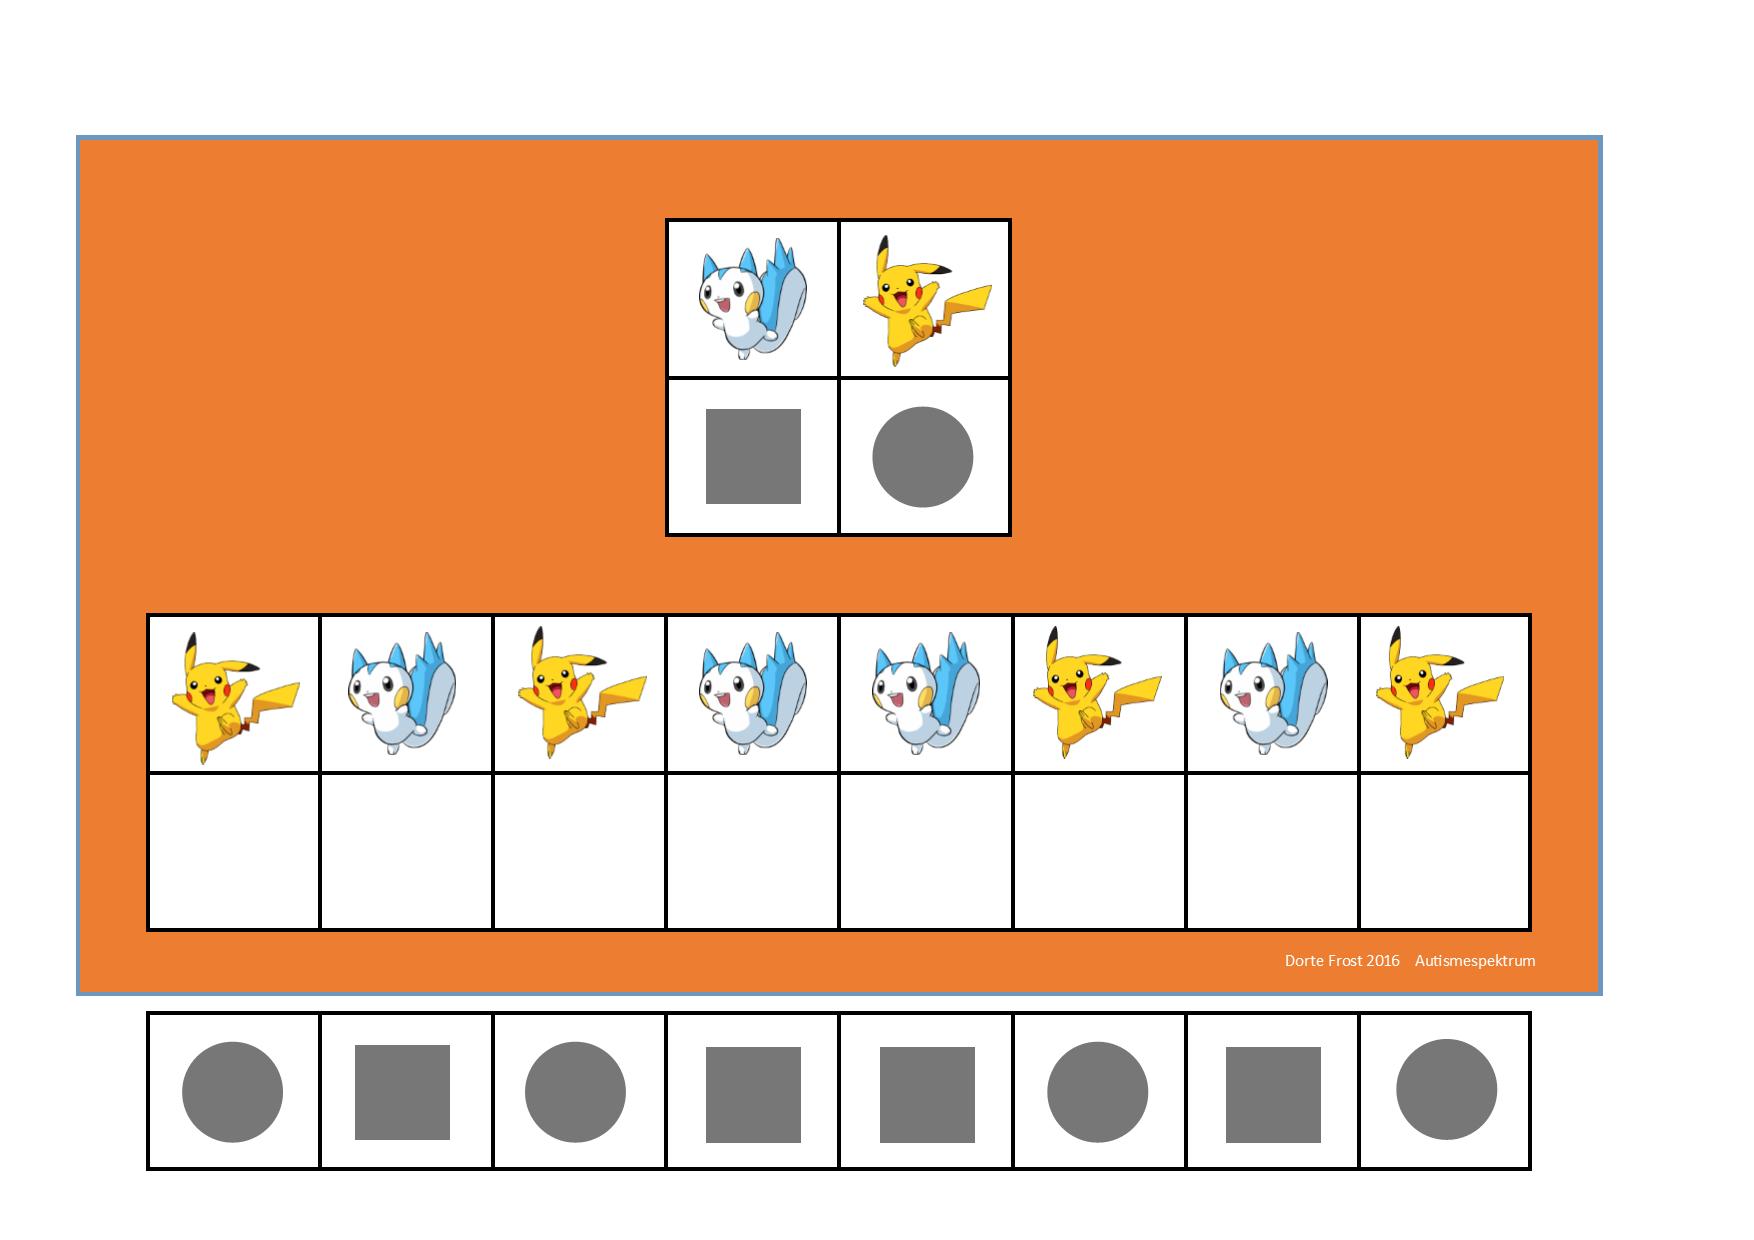 Board And Tiles For The 2 Pokemon Visual Perception Game By Autismespektrum Visual Perception Perception Math [ 1240 x 1754 Pixel ]